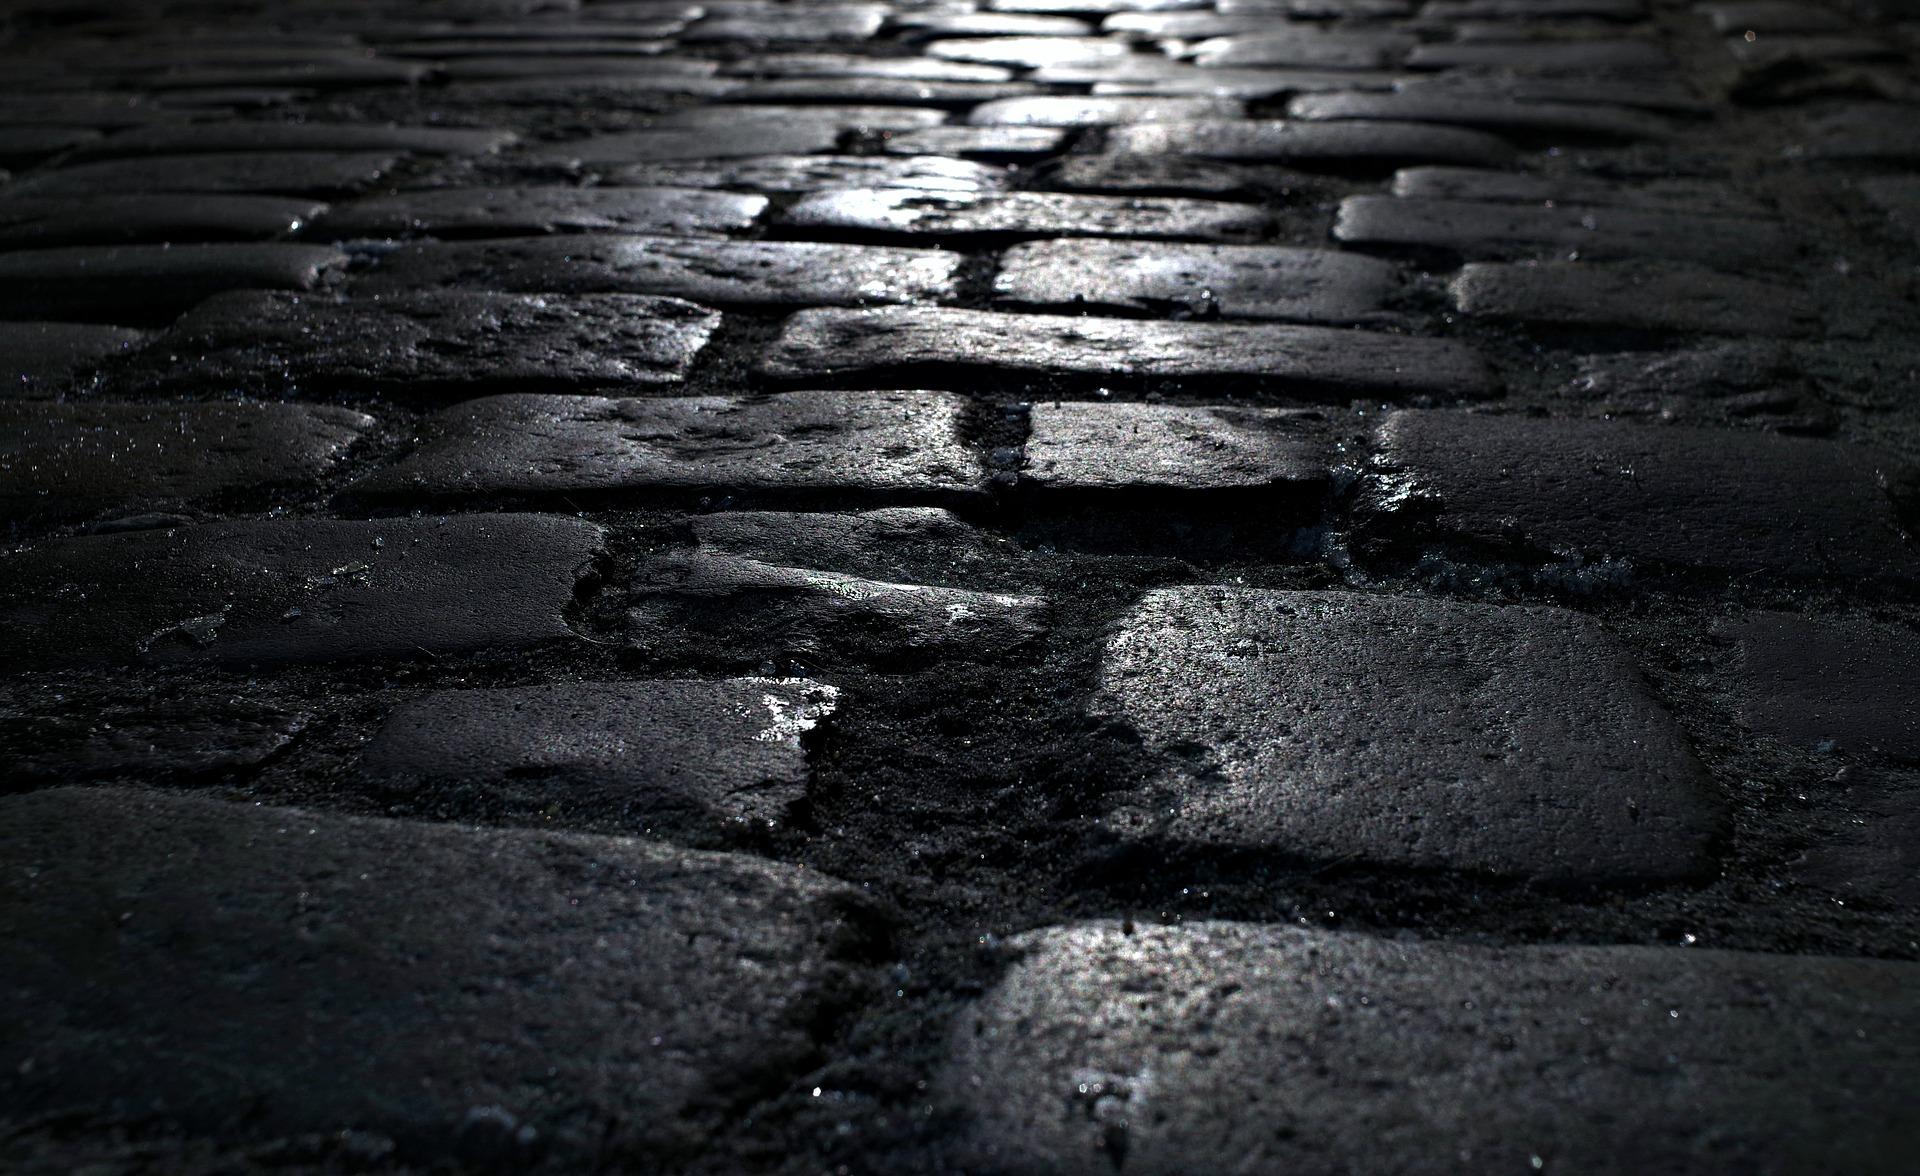 pavement-3103891_1920